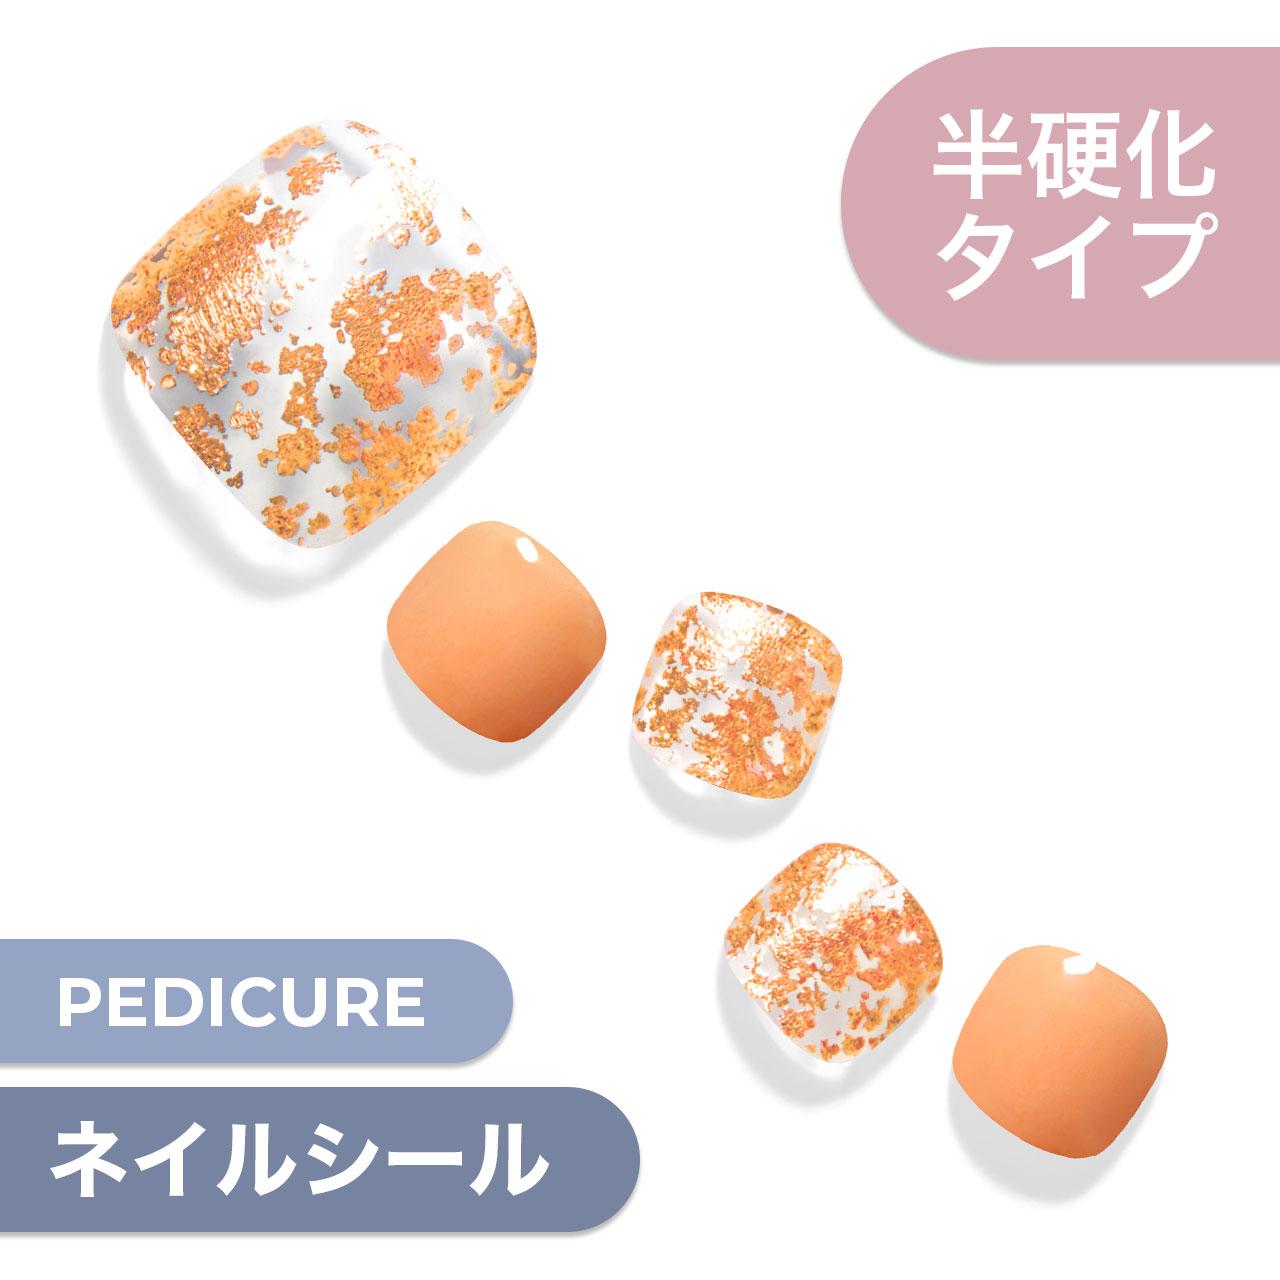 【Orange Flakes】ダッシングディバグレーズ ペディ